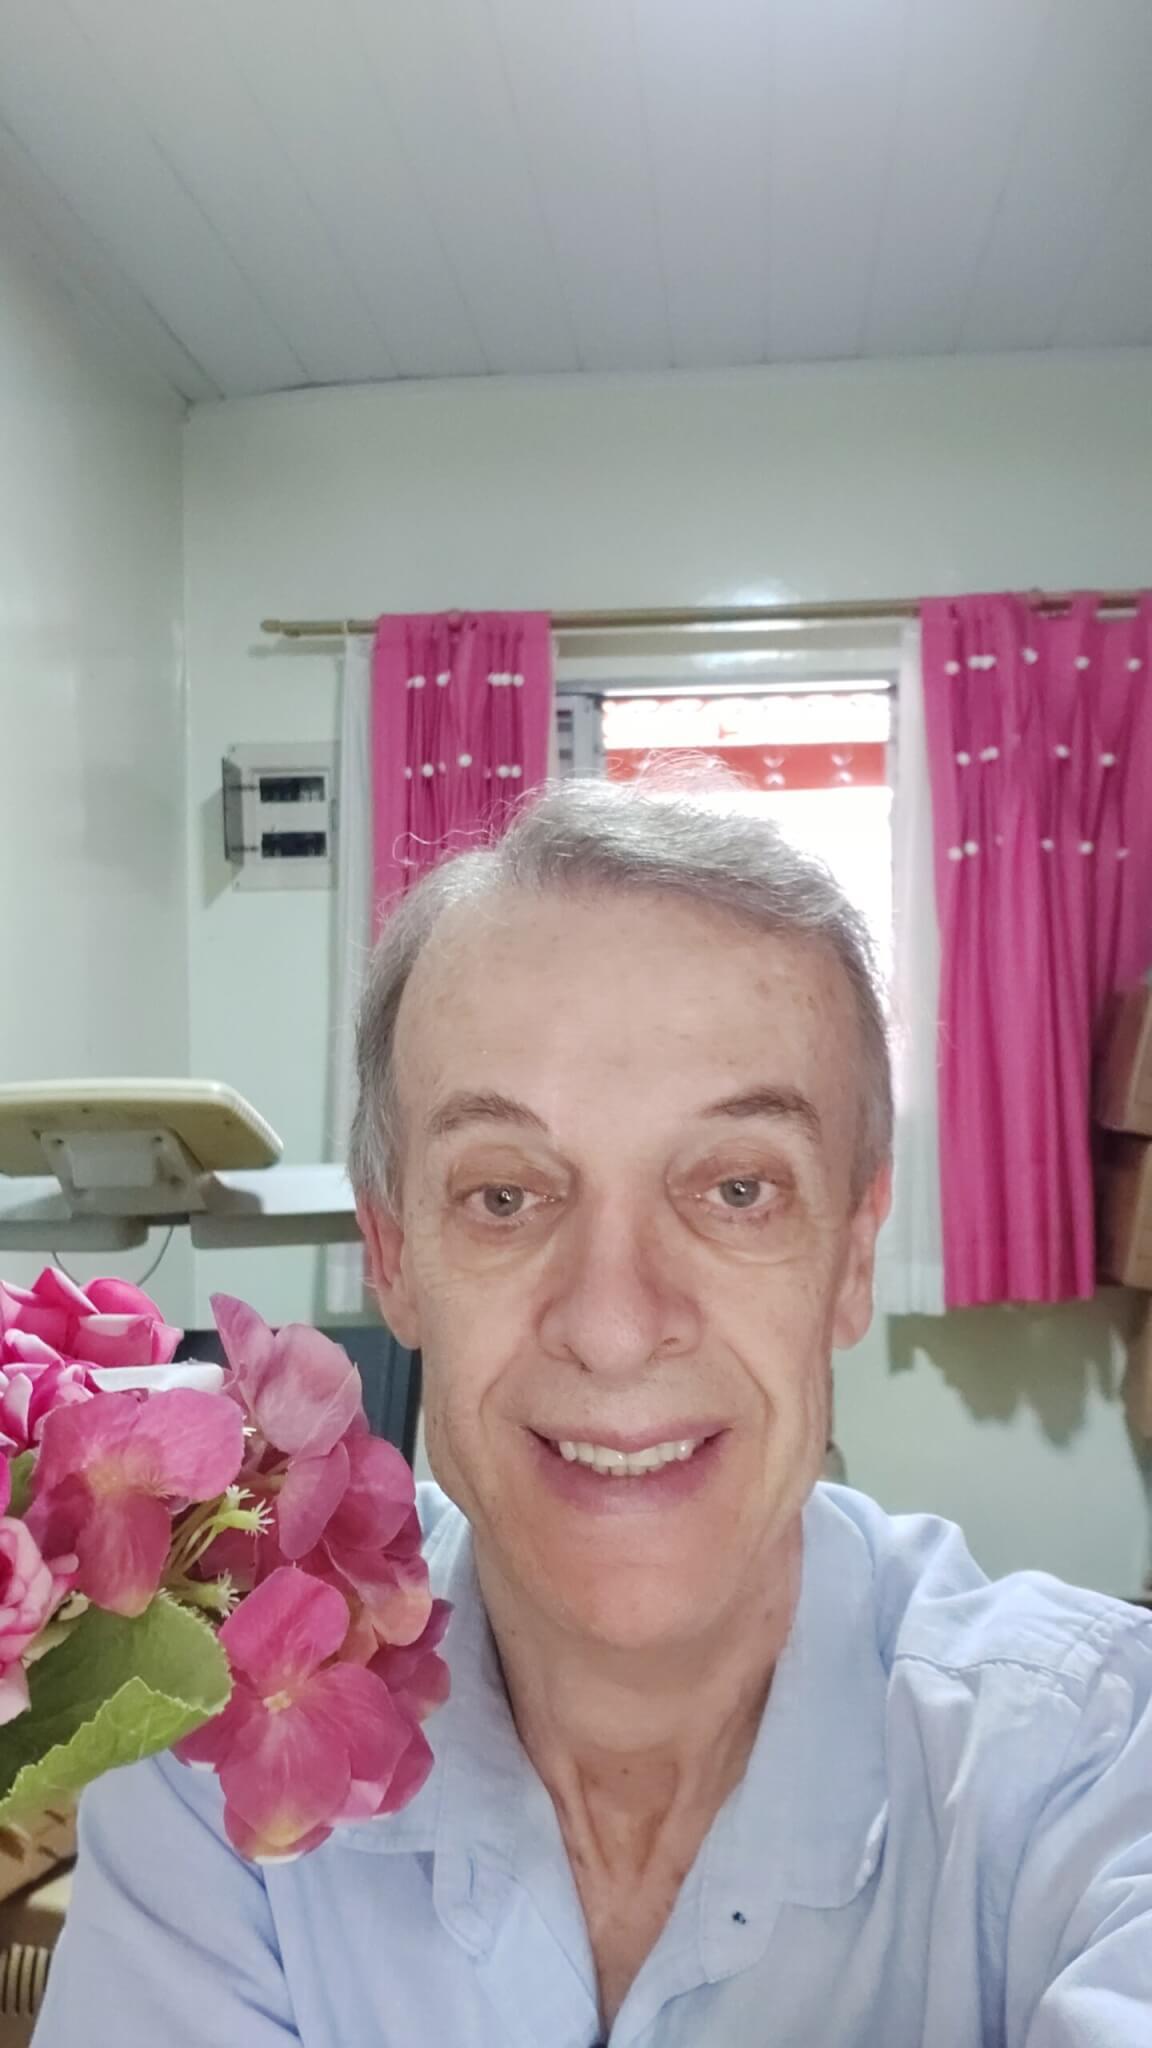 Eduardo Tischer